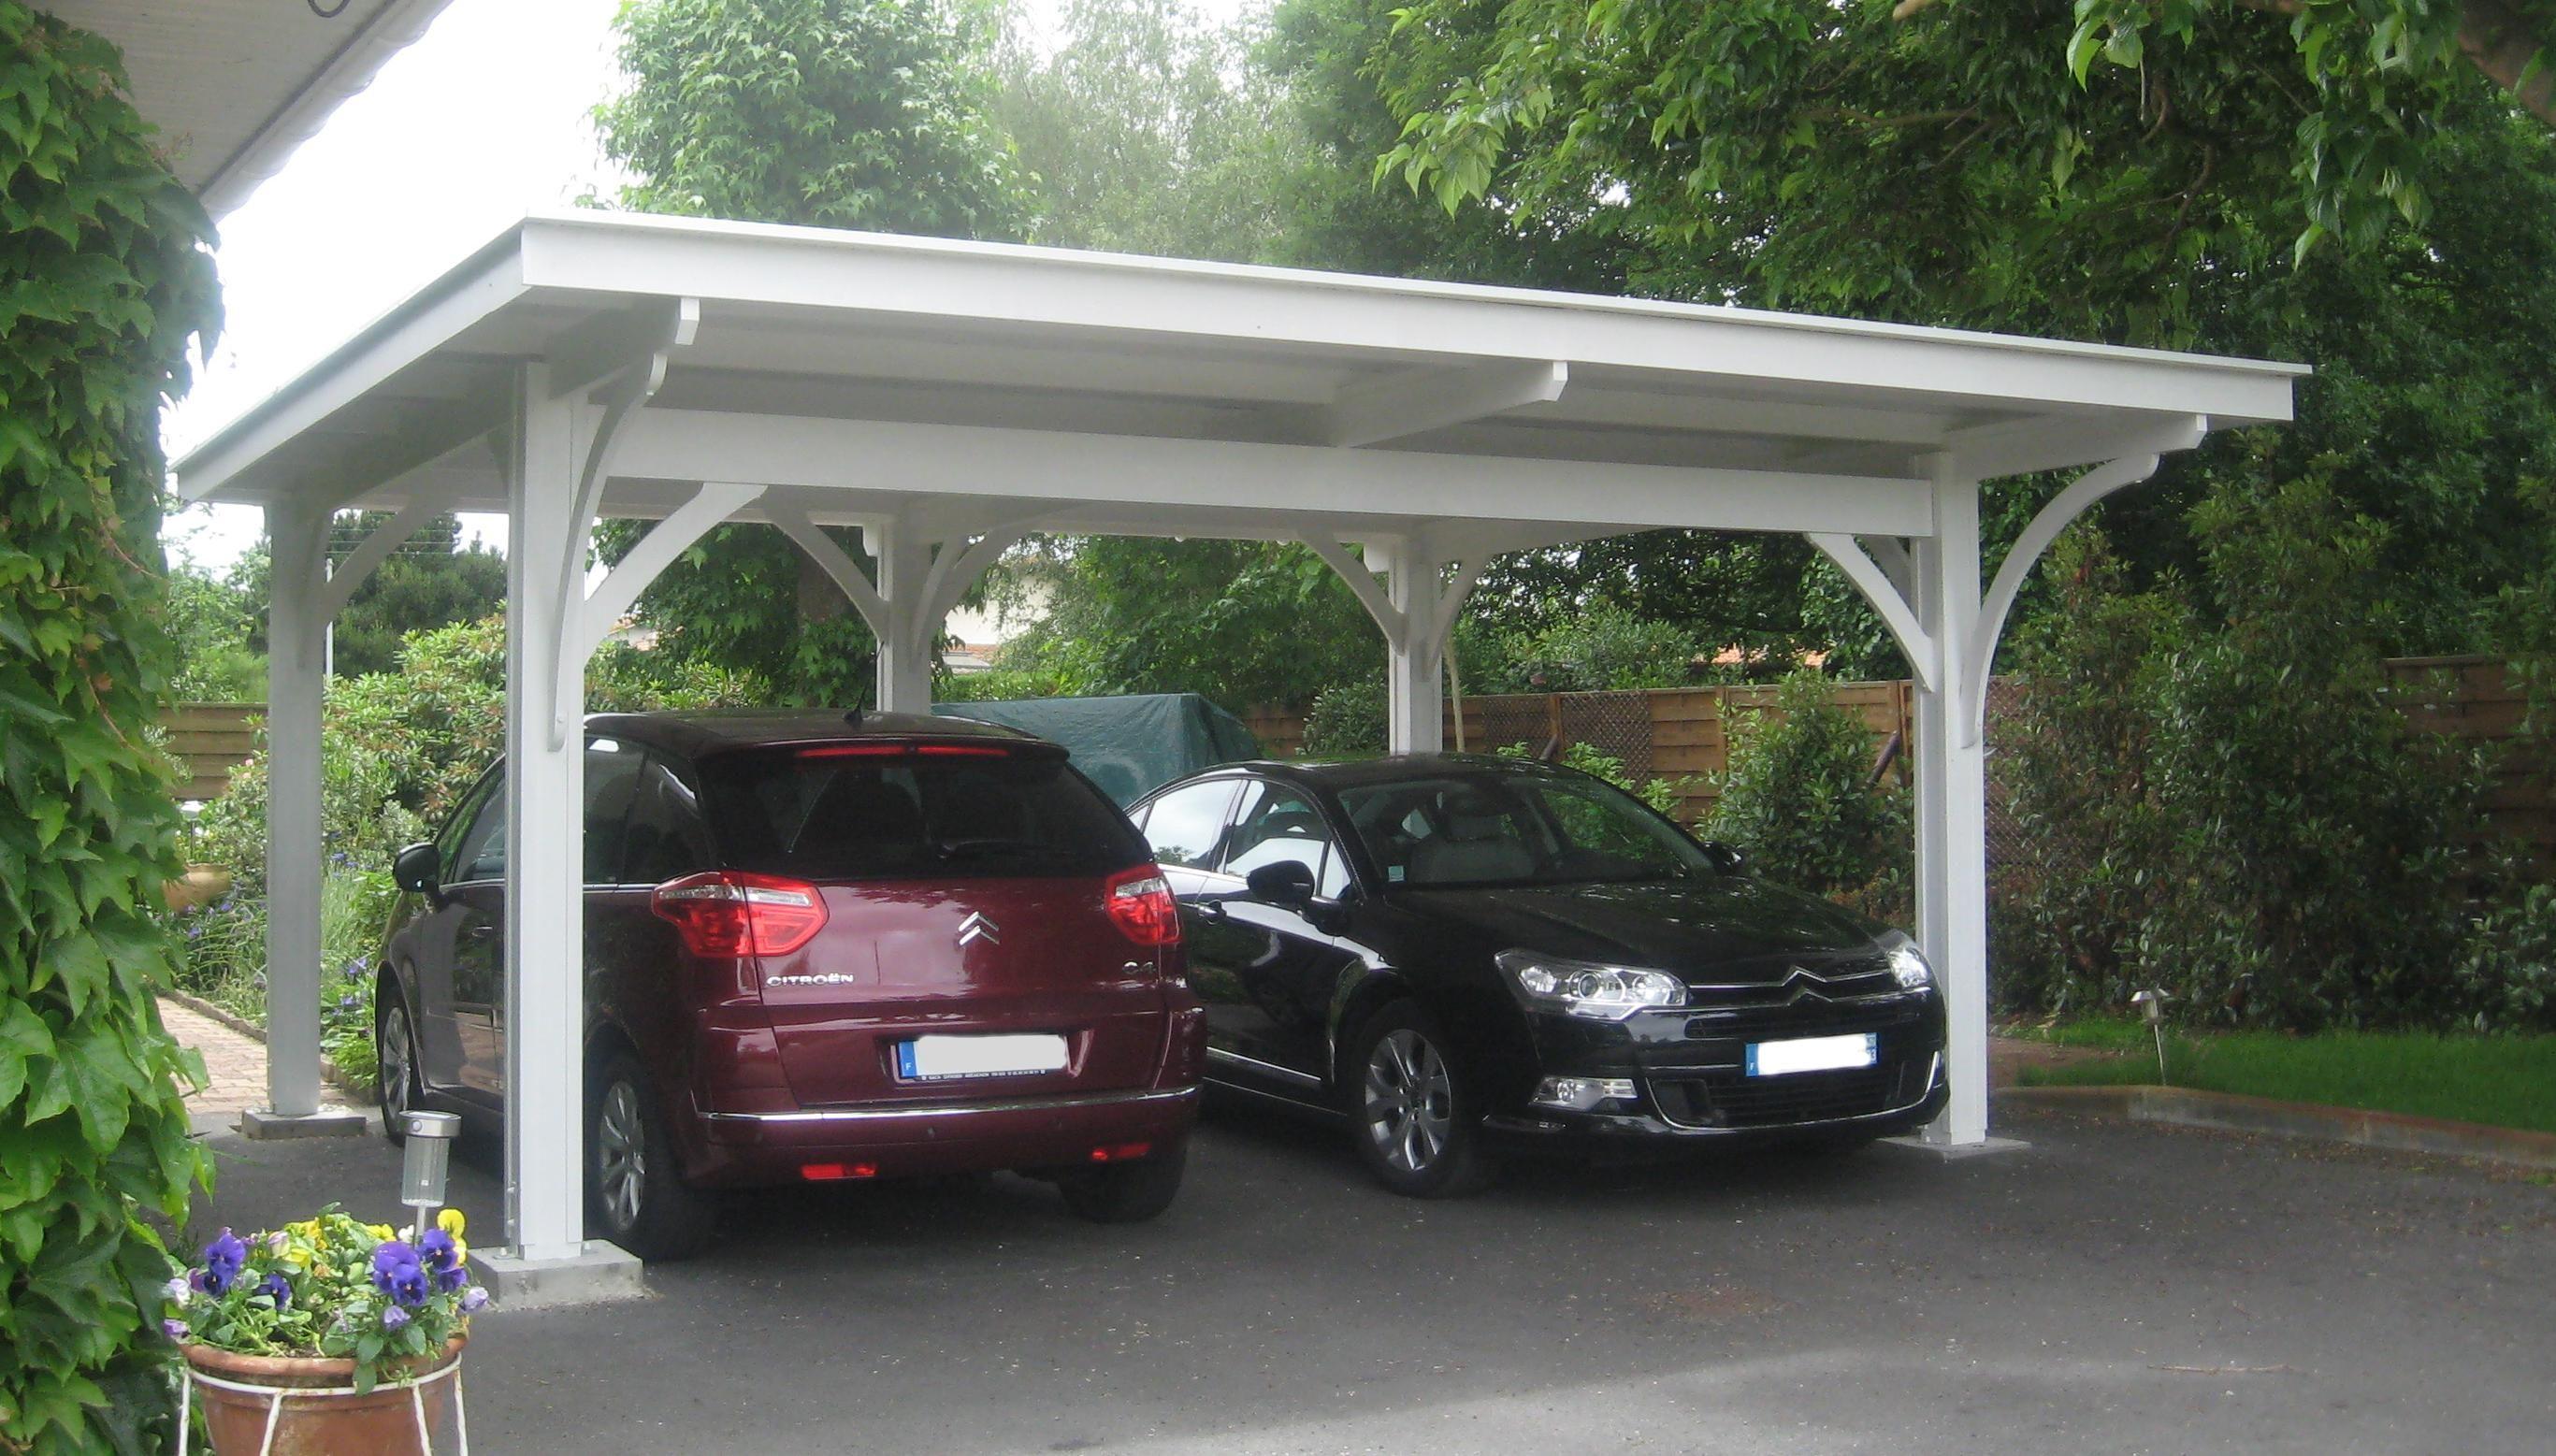 Pérgola para coche usada como garaje